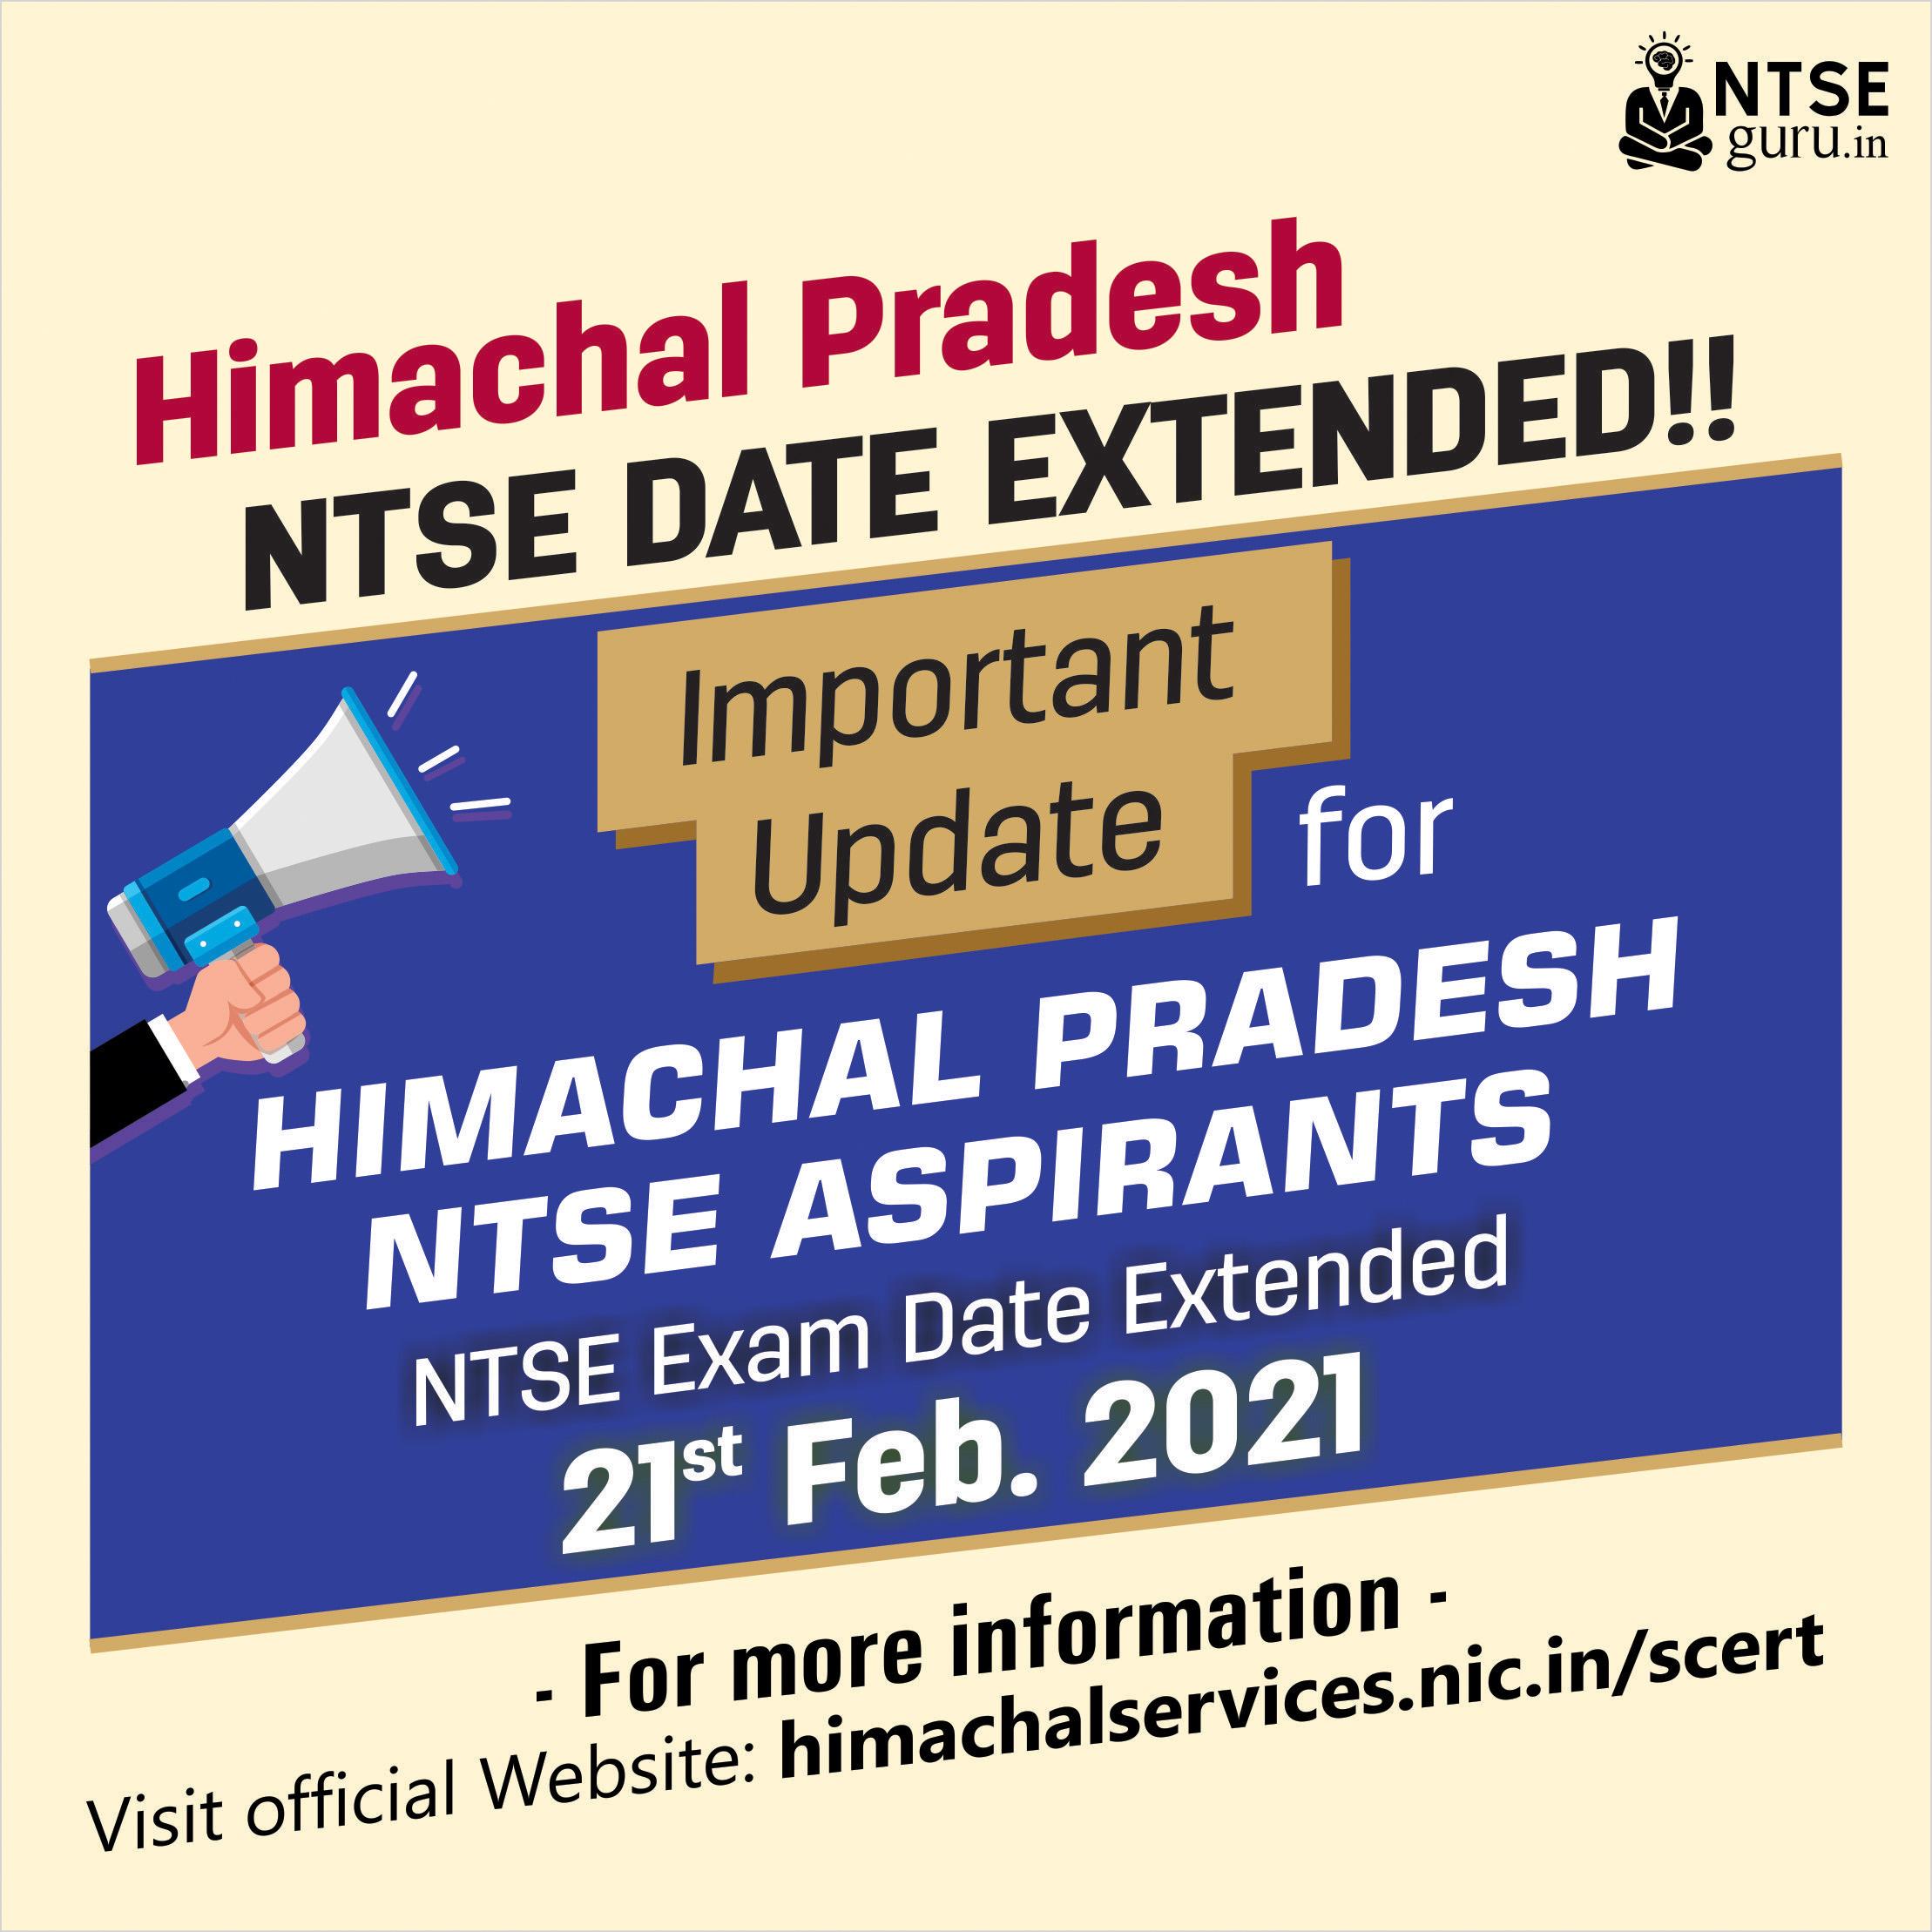 Himachal Pradesh NTSE Exam Date